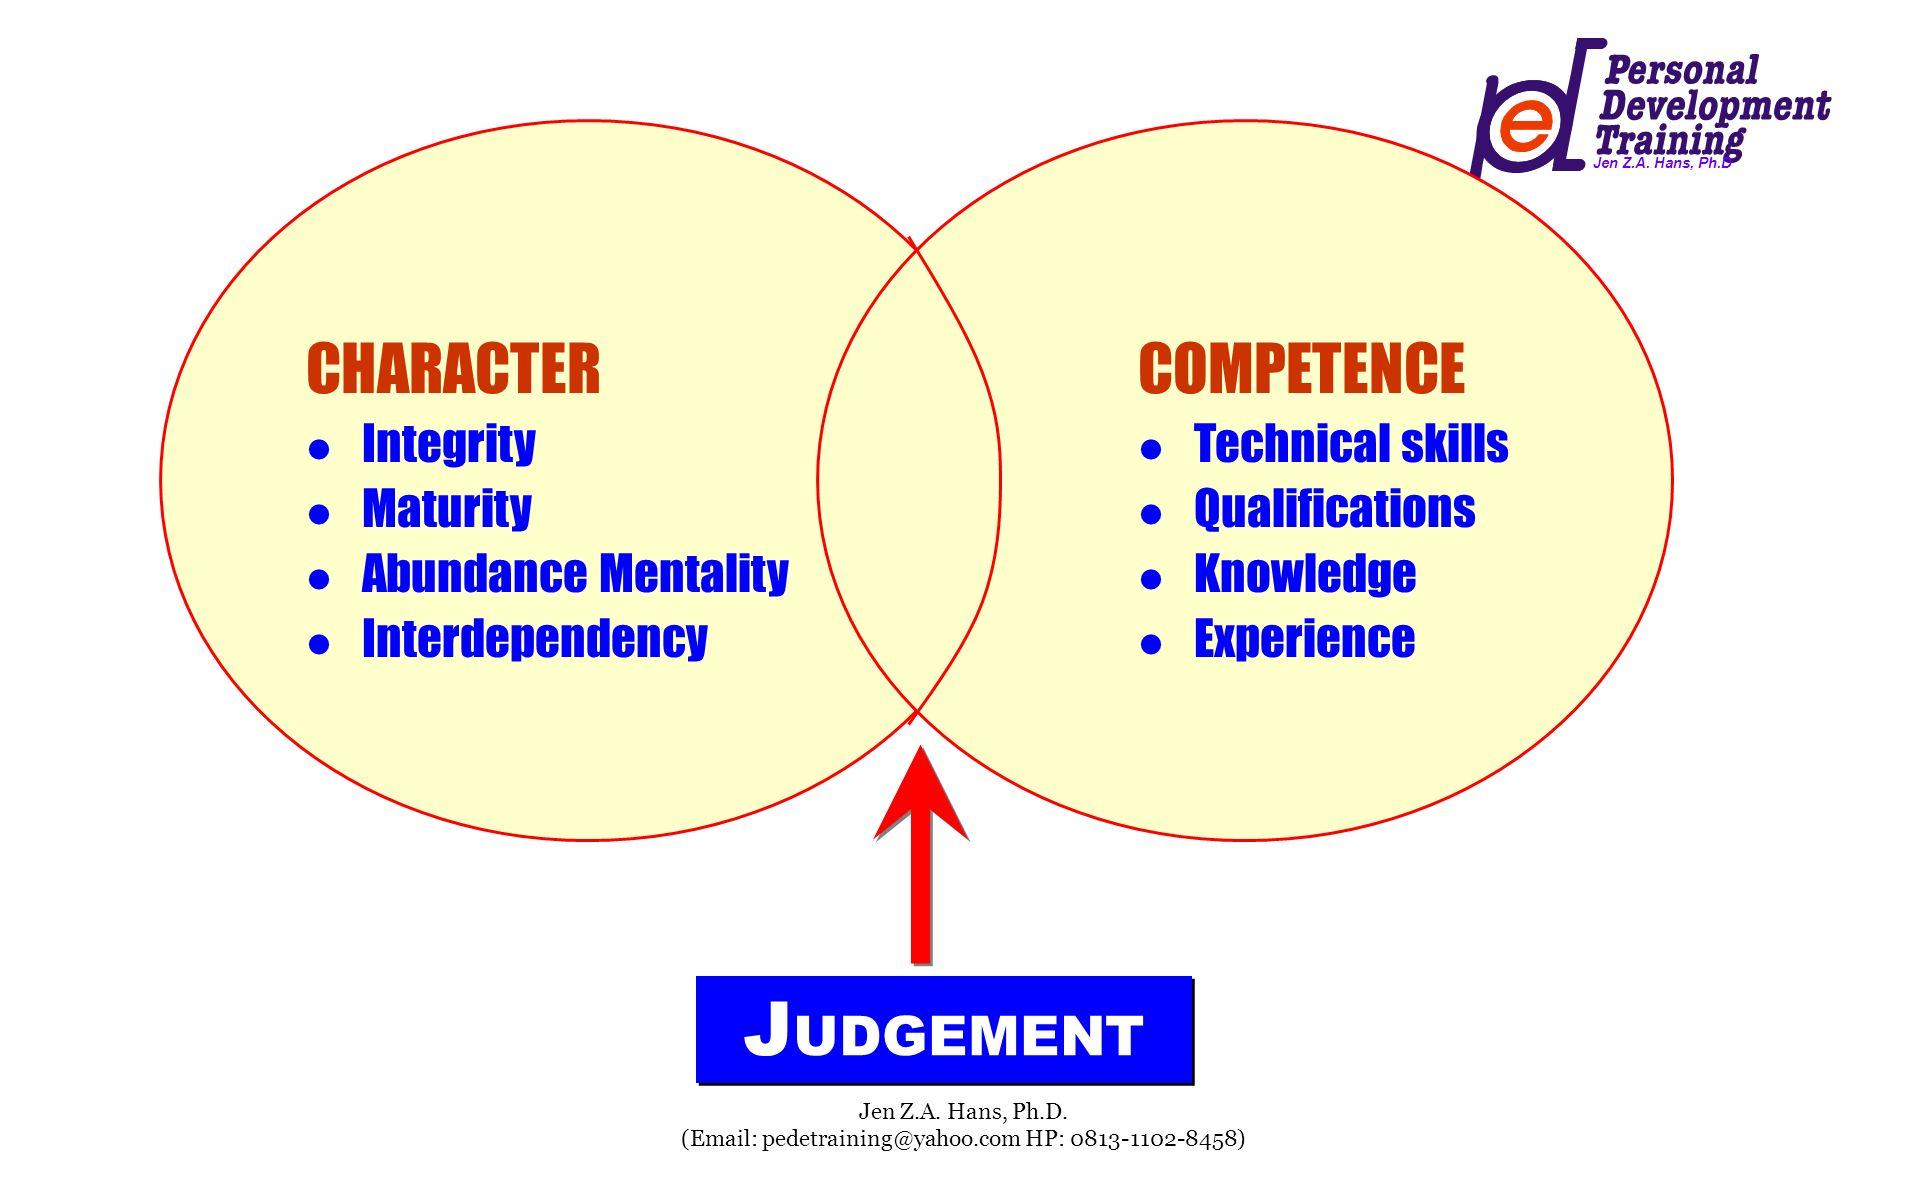 Jen Z.A. Hans, Ph.D Jen Z.A. Hans, Ph.D. (Email: pedetraining@yahoo.com HP: 0813-1102-8458) J UDGEMENT CHARACTER Integrity Maturity Abundance Mentalit